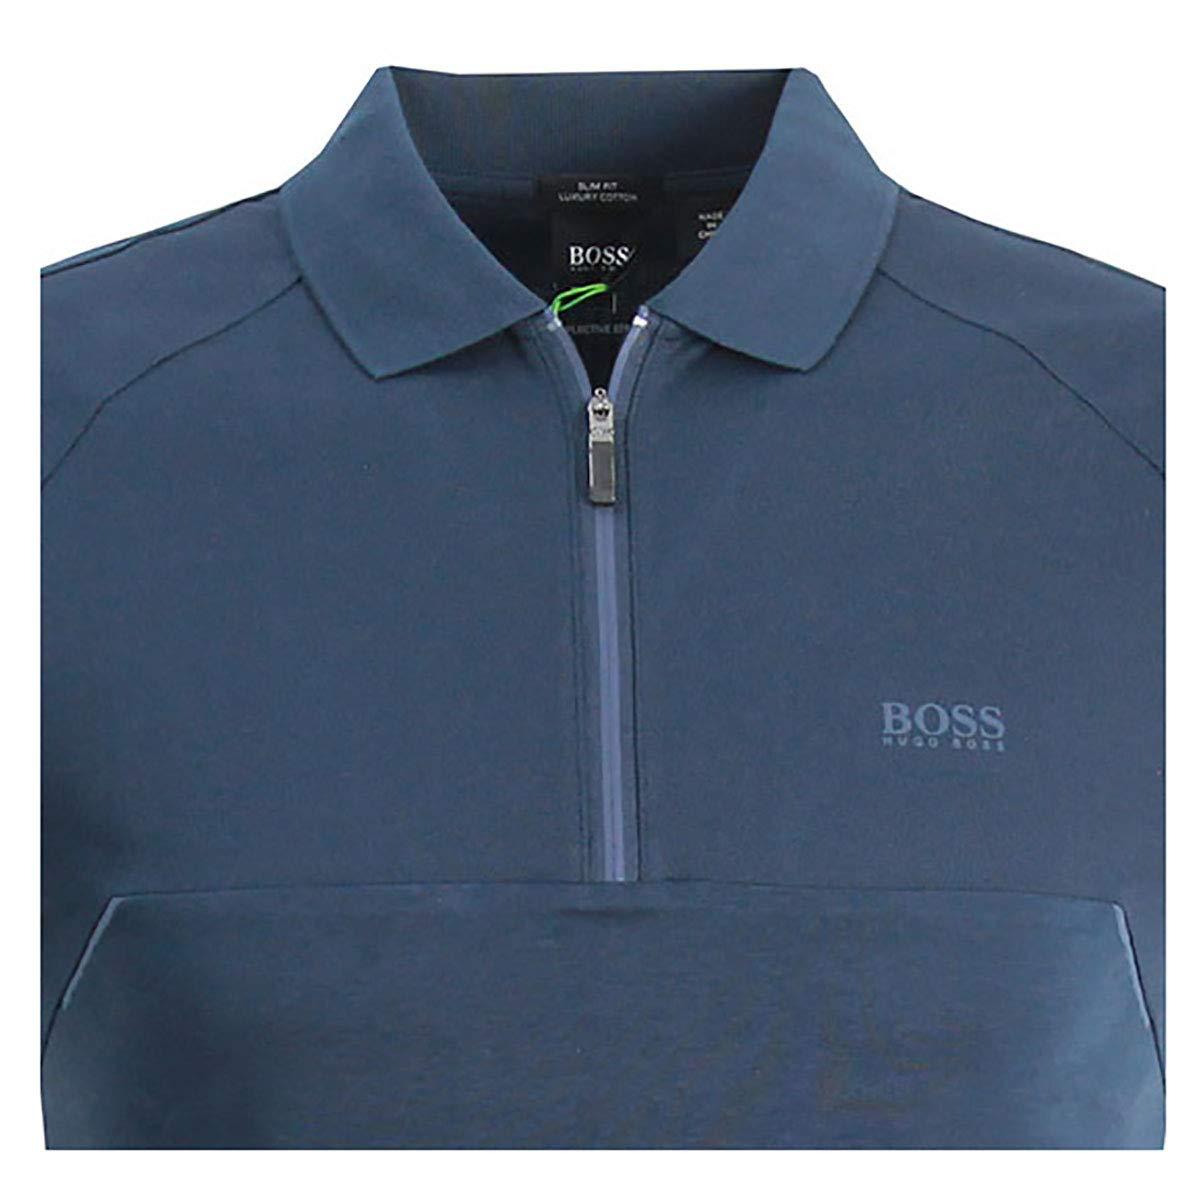 07a697696 Amazon.com: Hugo Boss Mens Polos Philix 1 Navy 50399460 410: Clothing